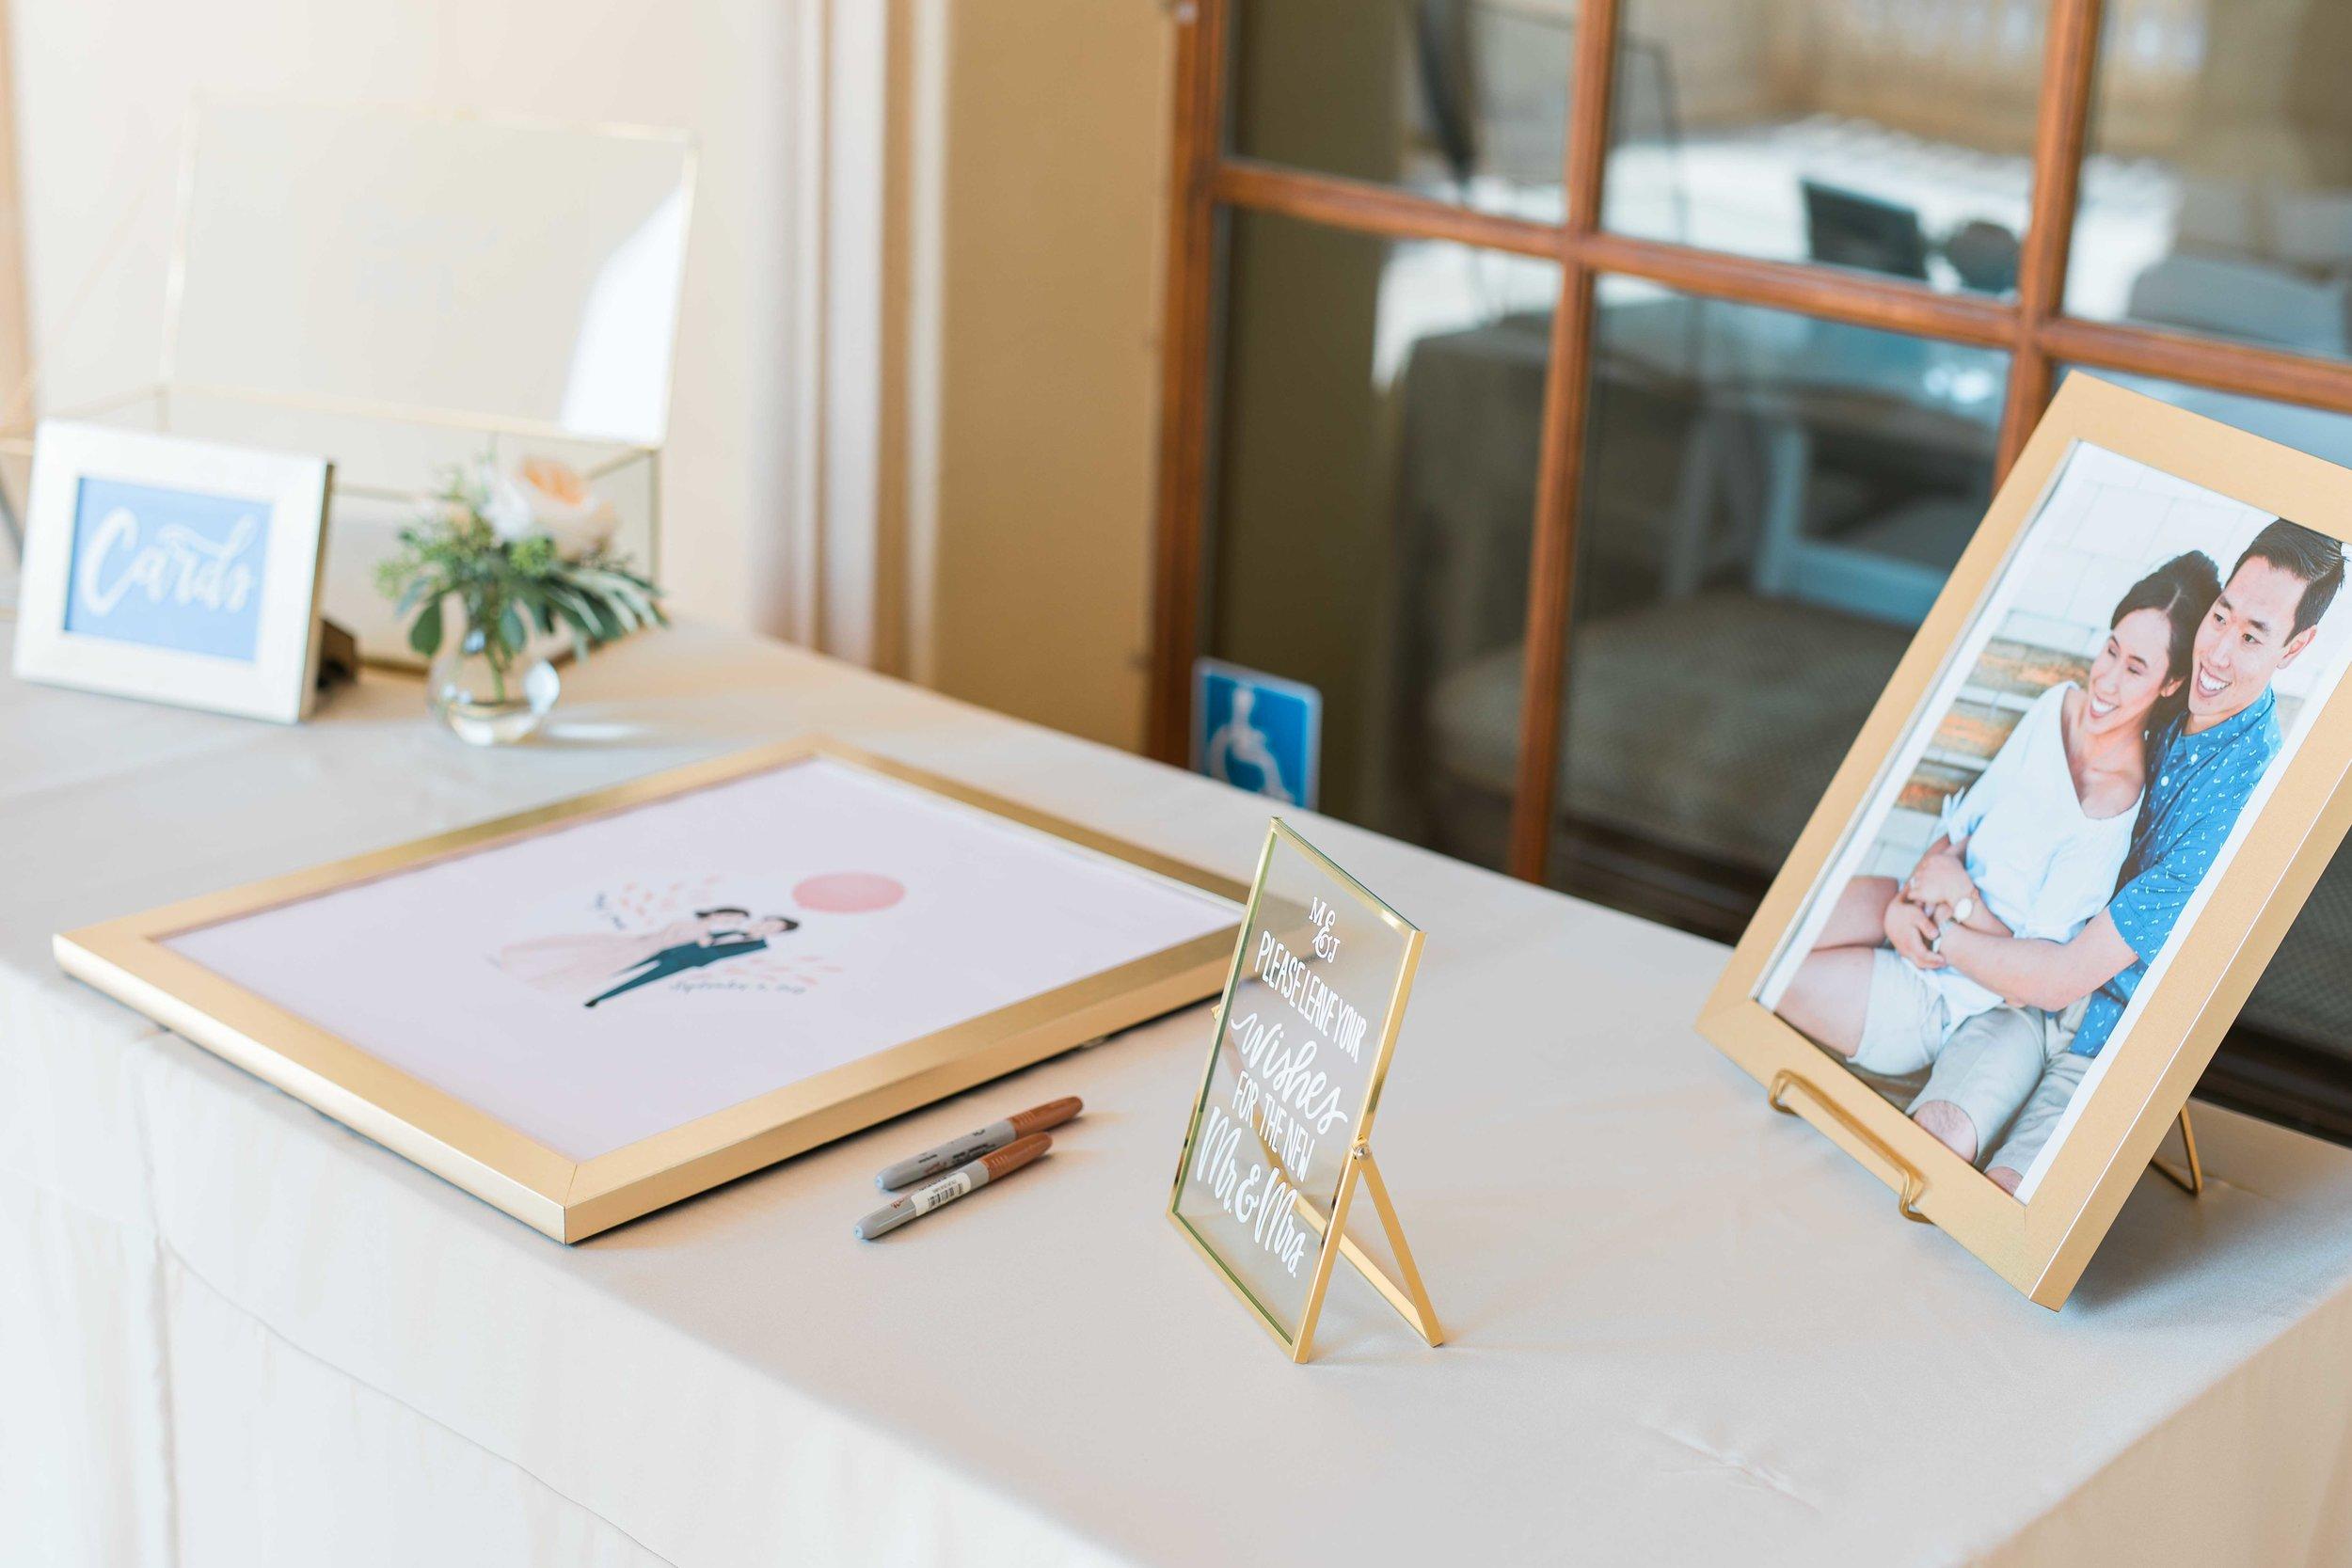 Ruby Hill Wedding Photos by JBJ Pictures - San Francisco Wedding Photographer - Pleasanton Wedding Venue (30).jpg